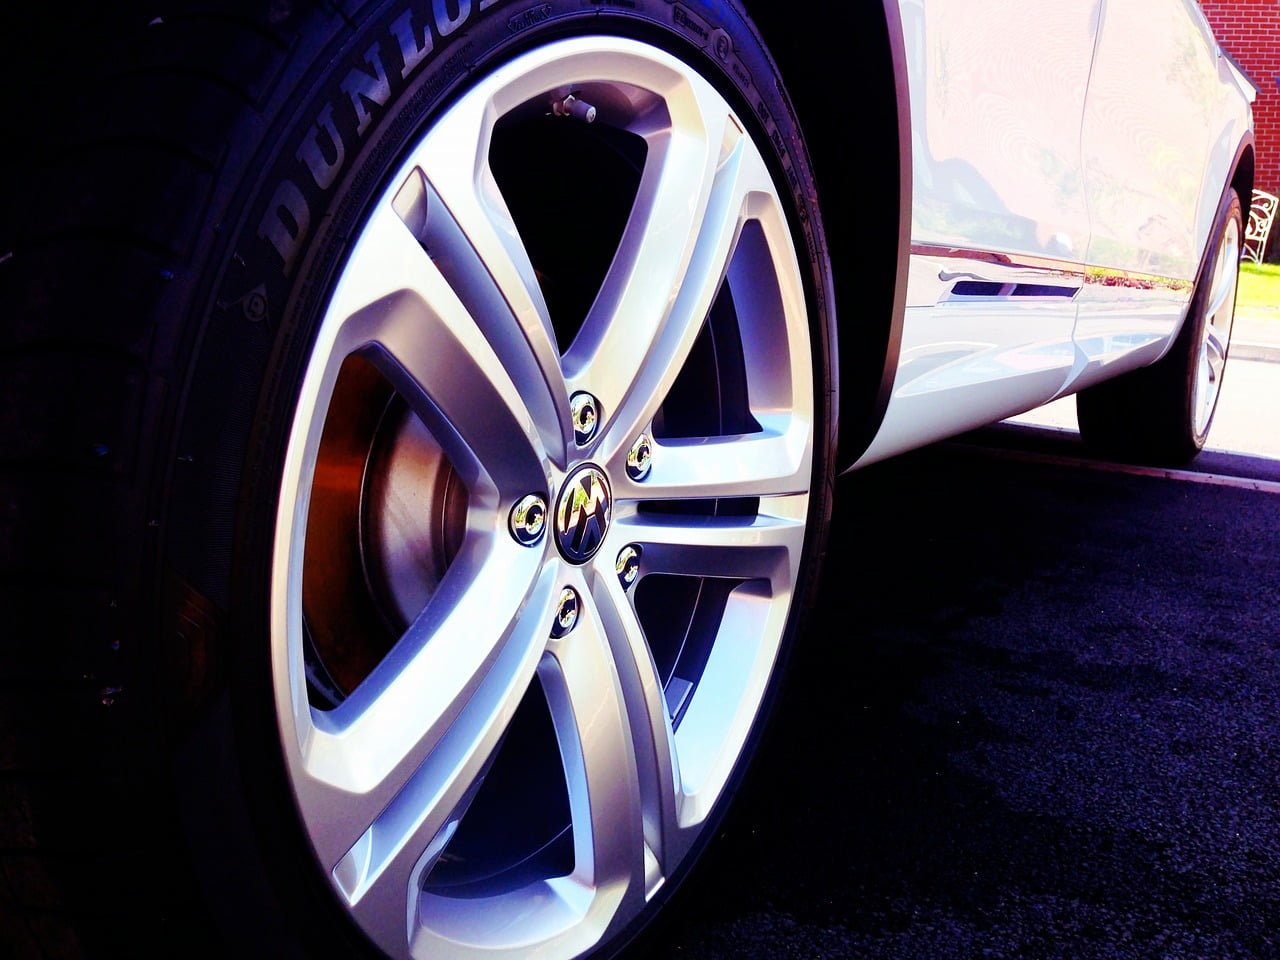 Dieselgate (Afera Volkswagena) - historia i konsekwencje prawne